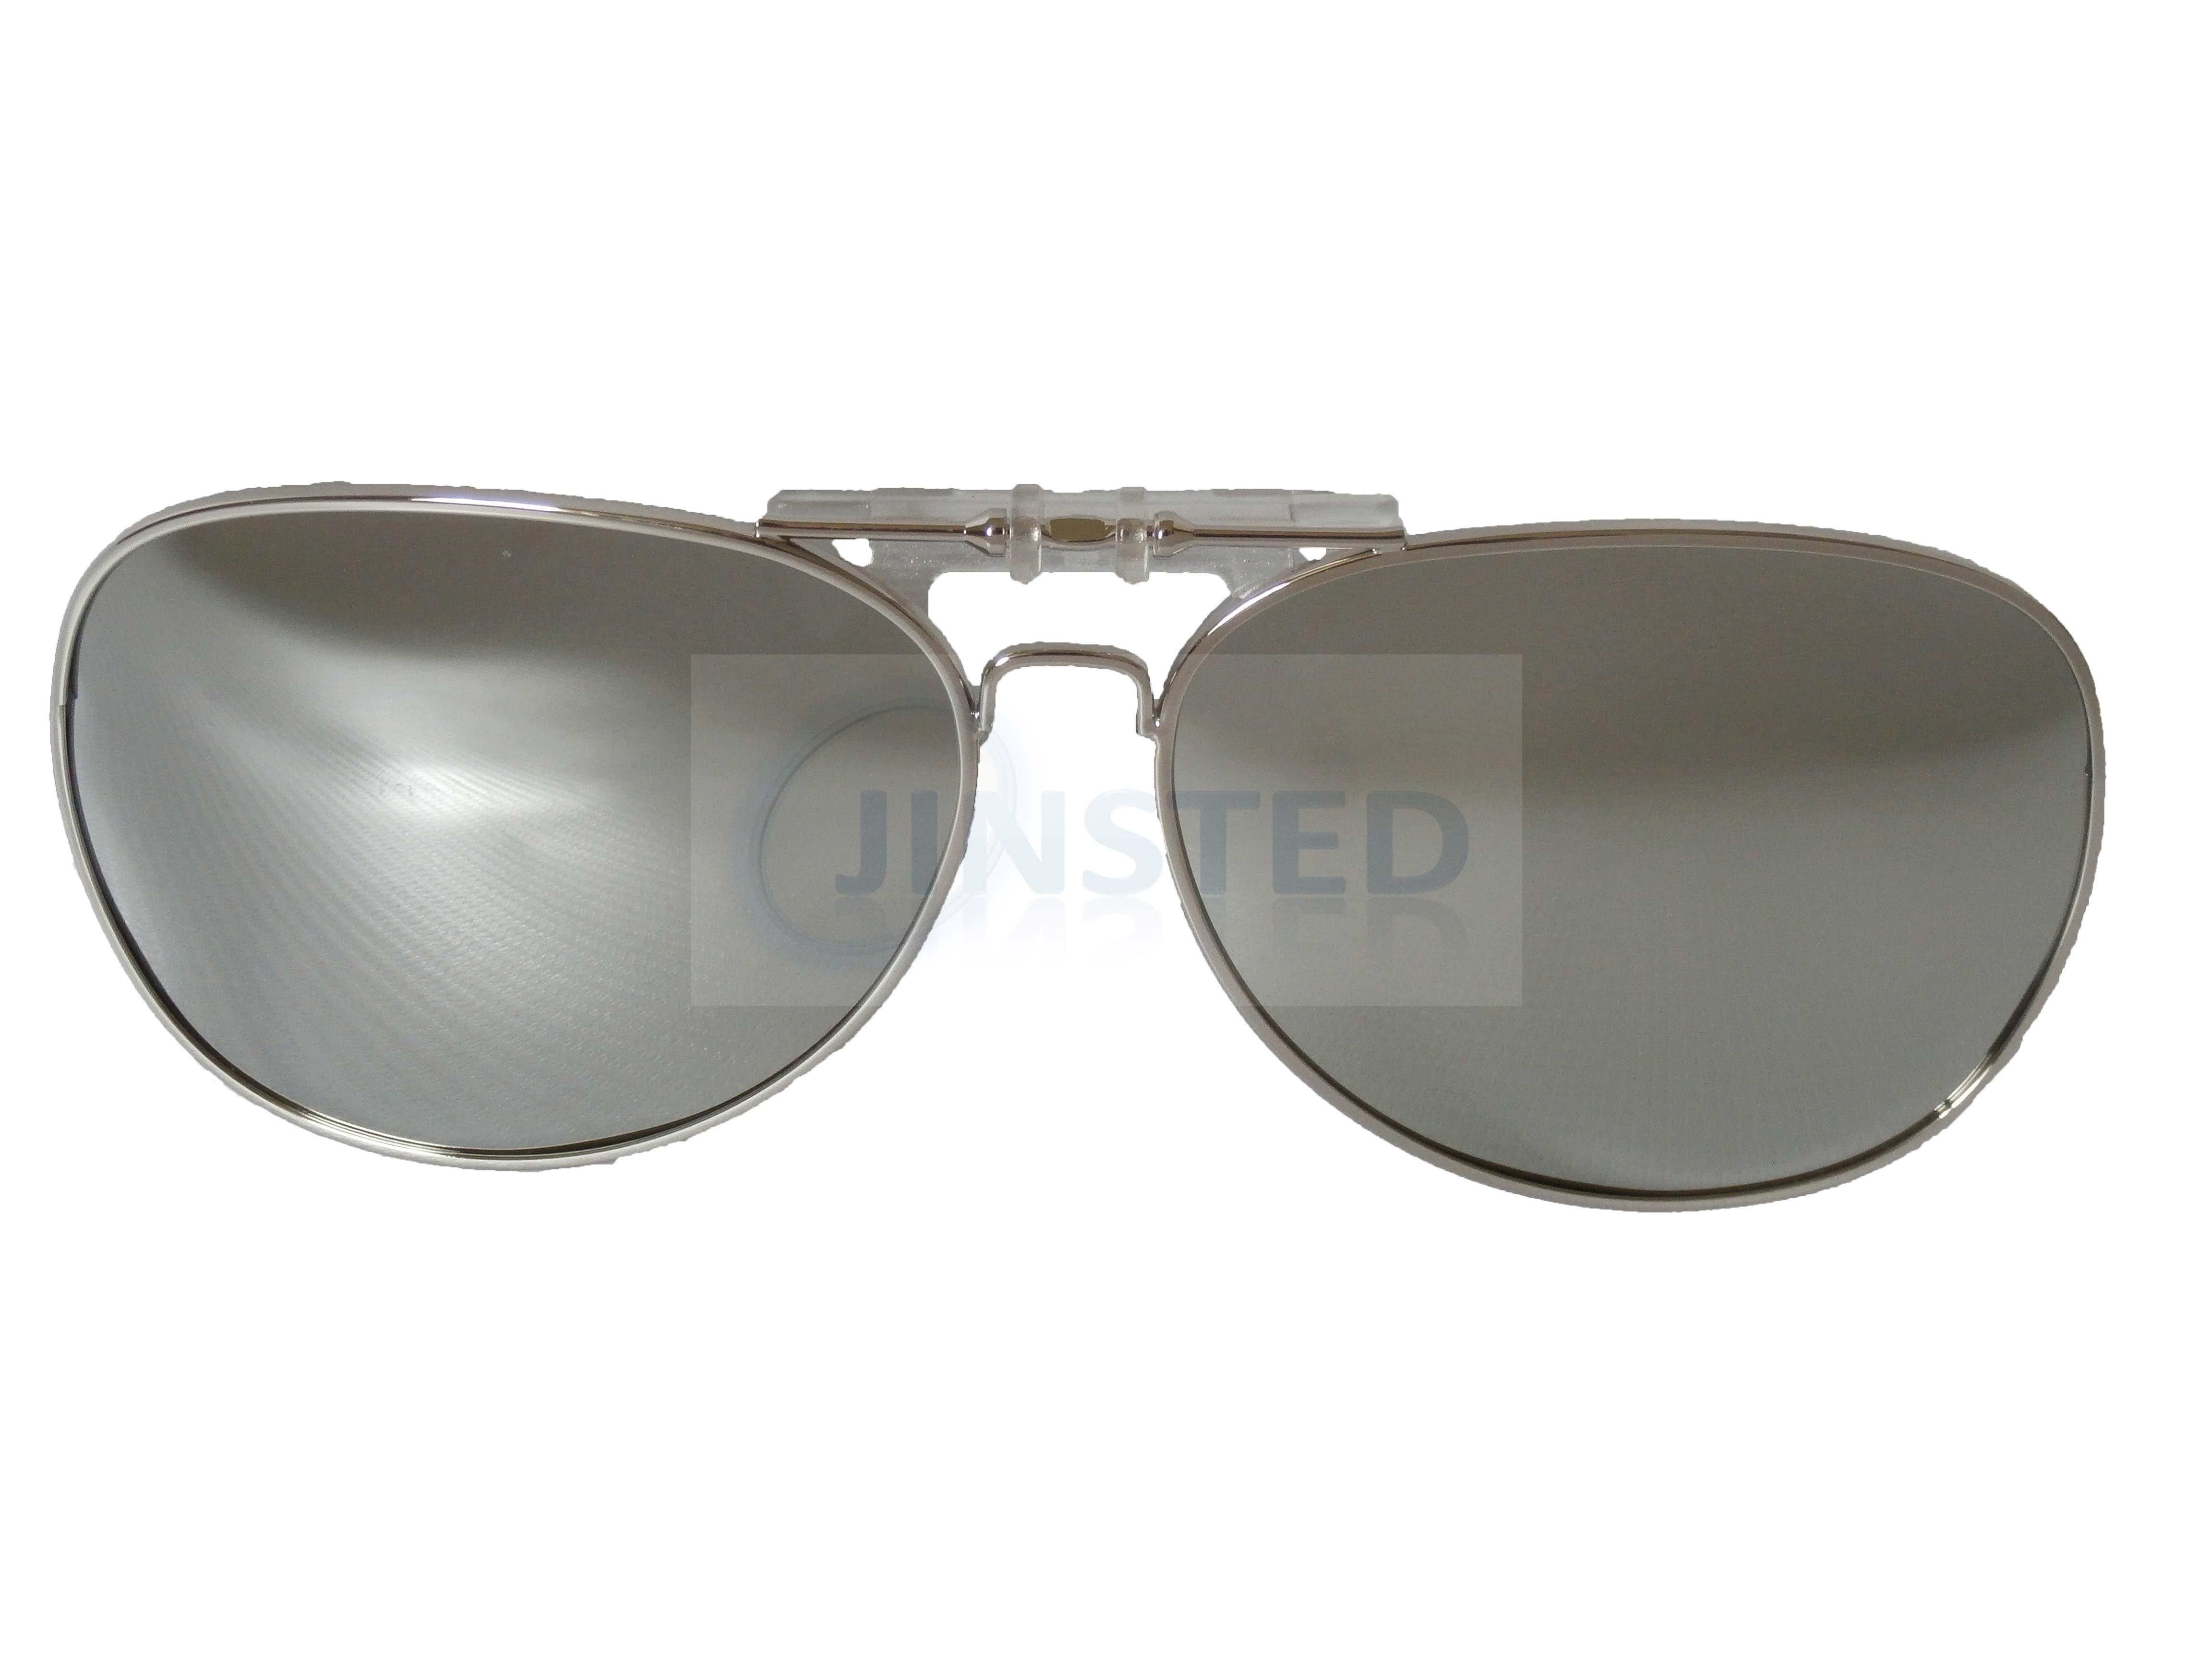 1b1c3fc201 Silver Mirrored Clip On Sunglasses Pilot Sunnies Flip Up Shades ...